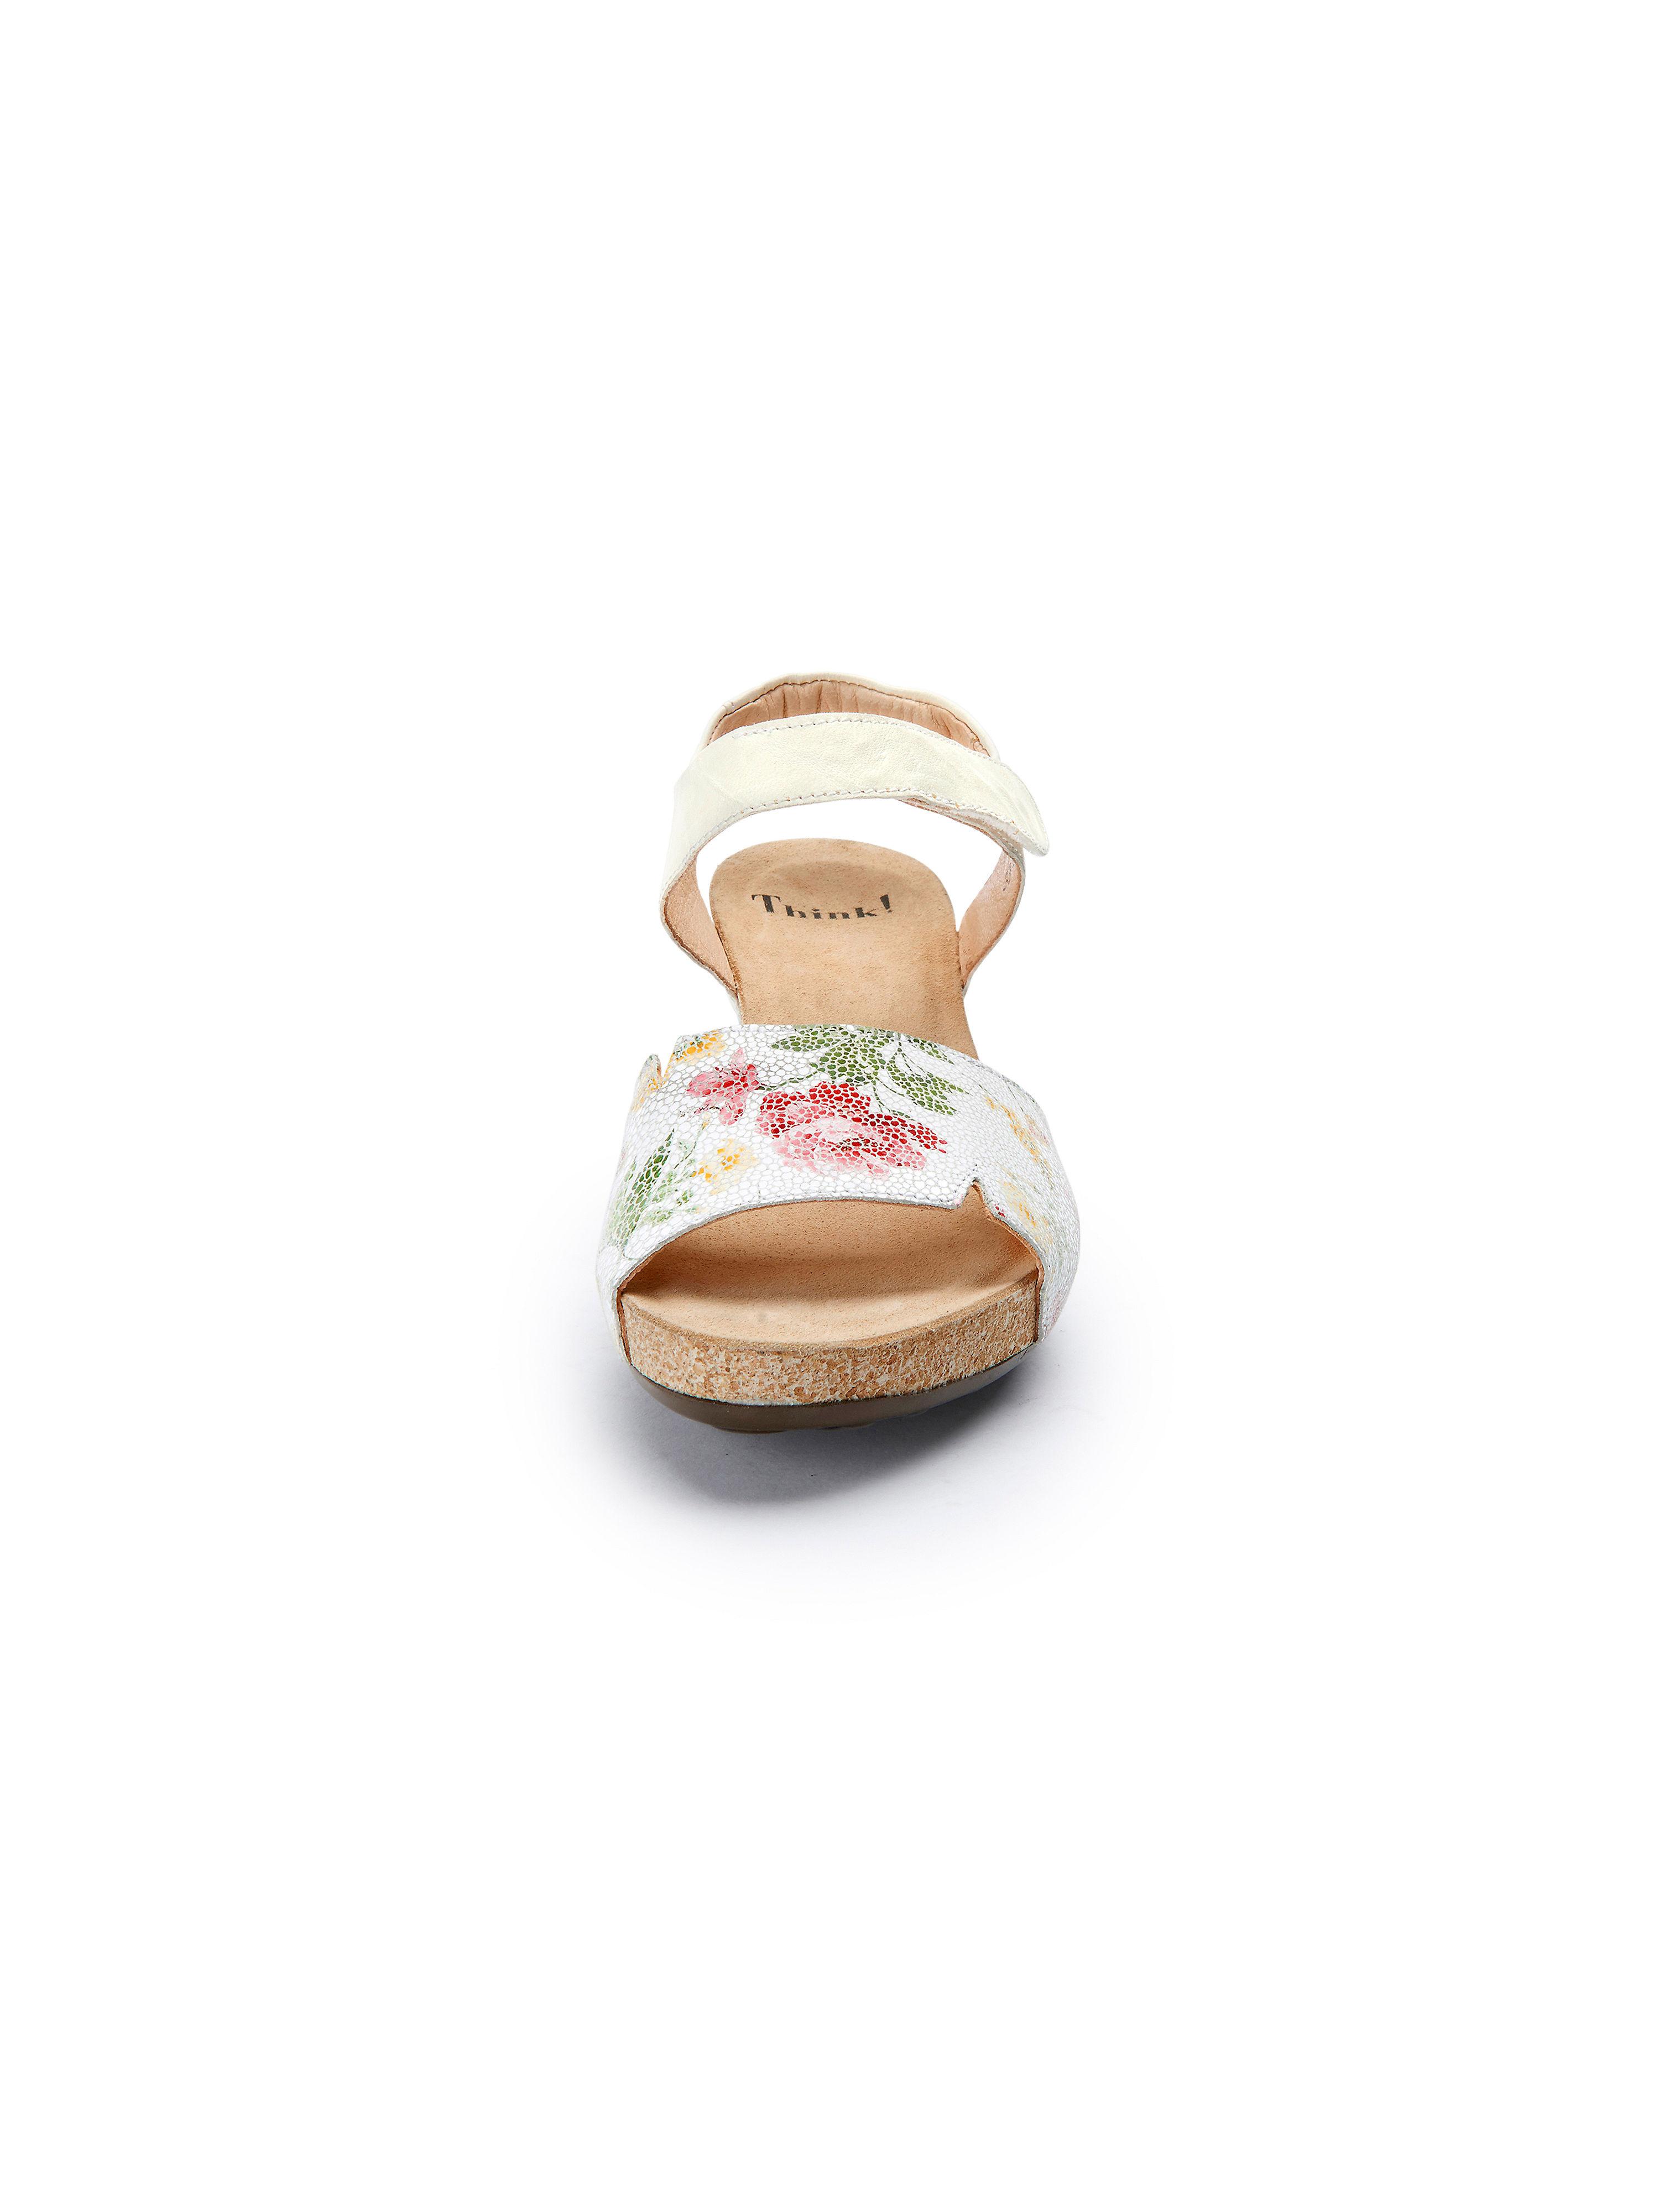 Think! - Plateau-Sandale Traudi aus 100% Leder beliebte - Weiß/Multicolor Gute Qualität beliebte Leder Schuhe f21d08